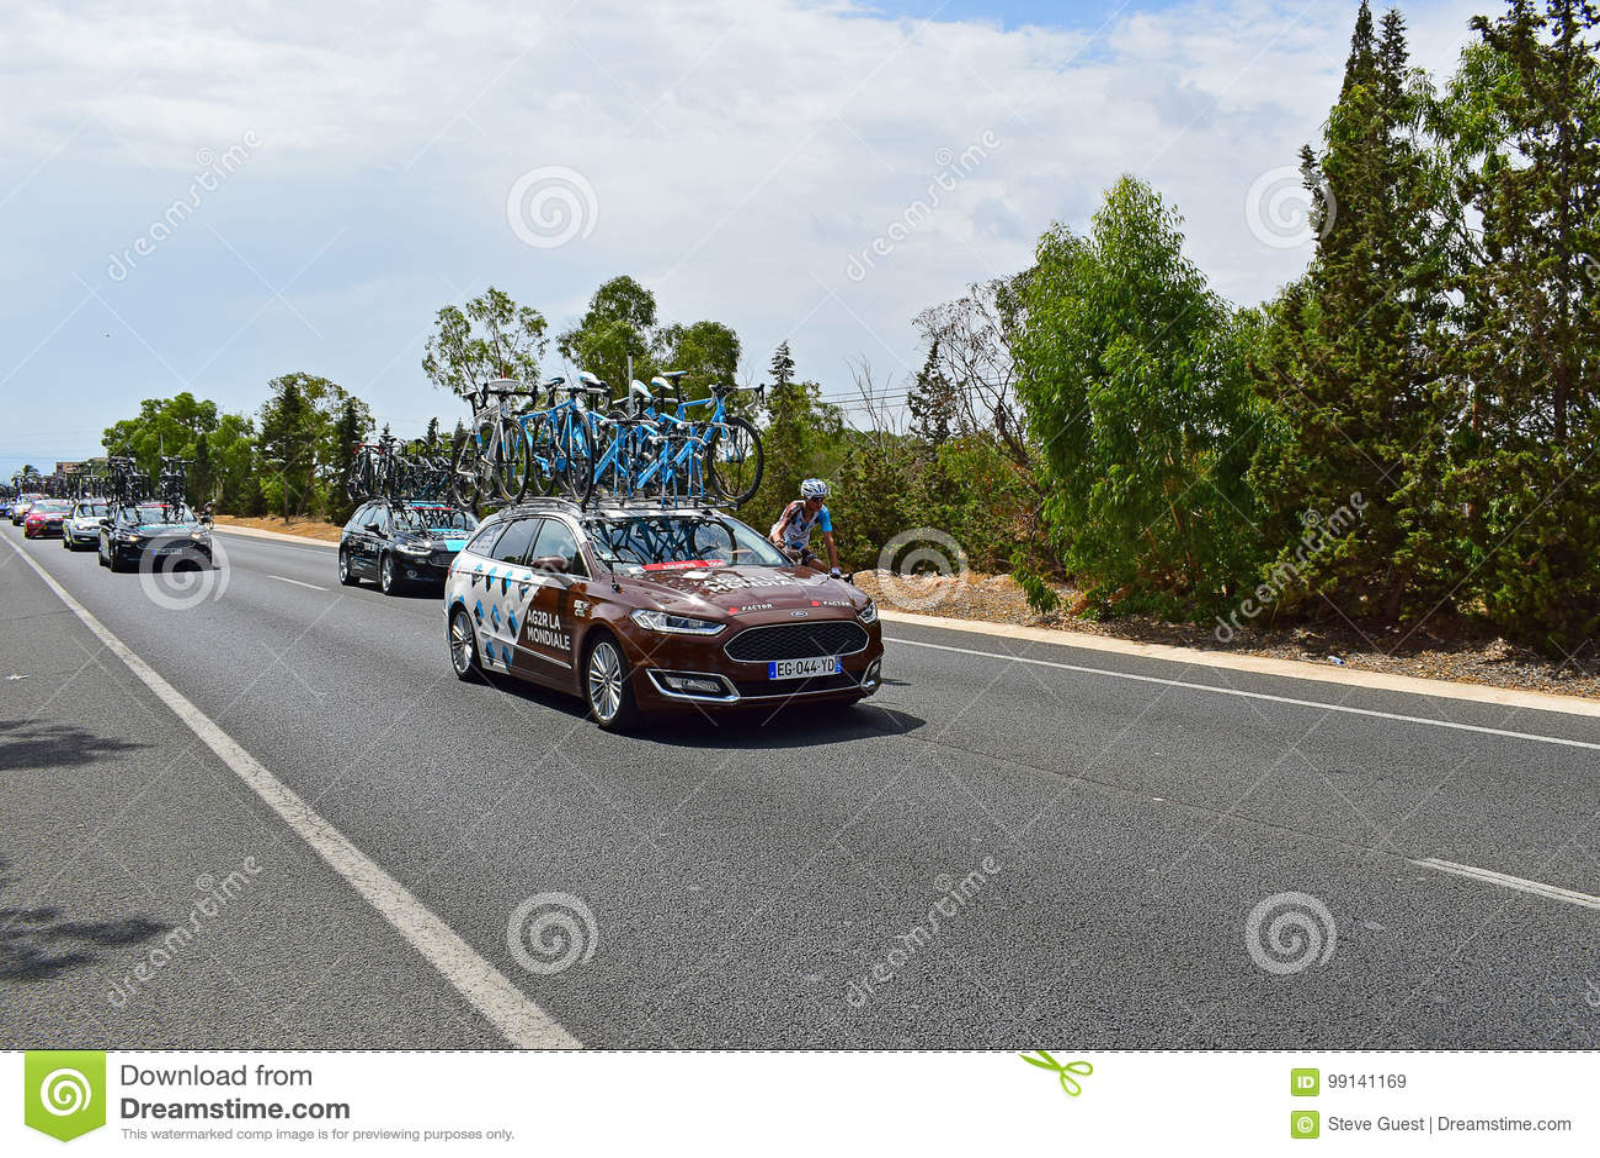 AG2R La Mondiale Car And Rider La Vuelta España